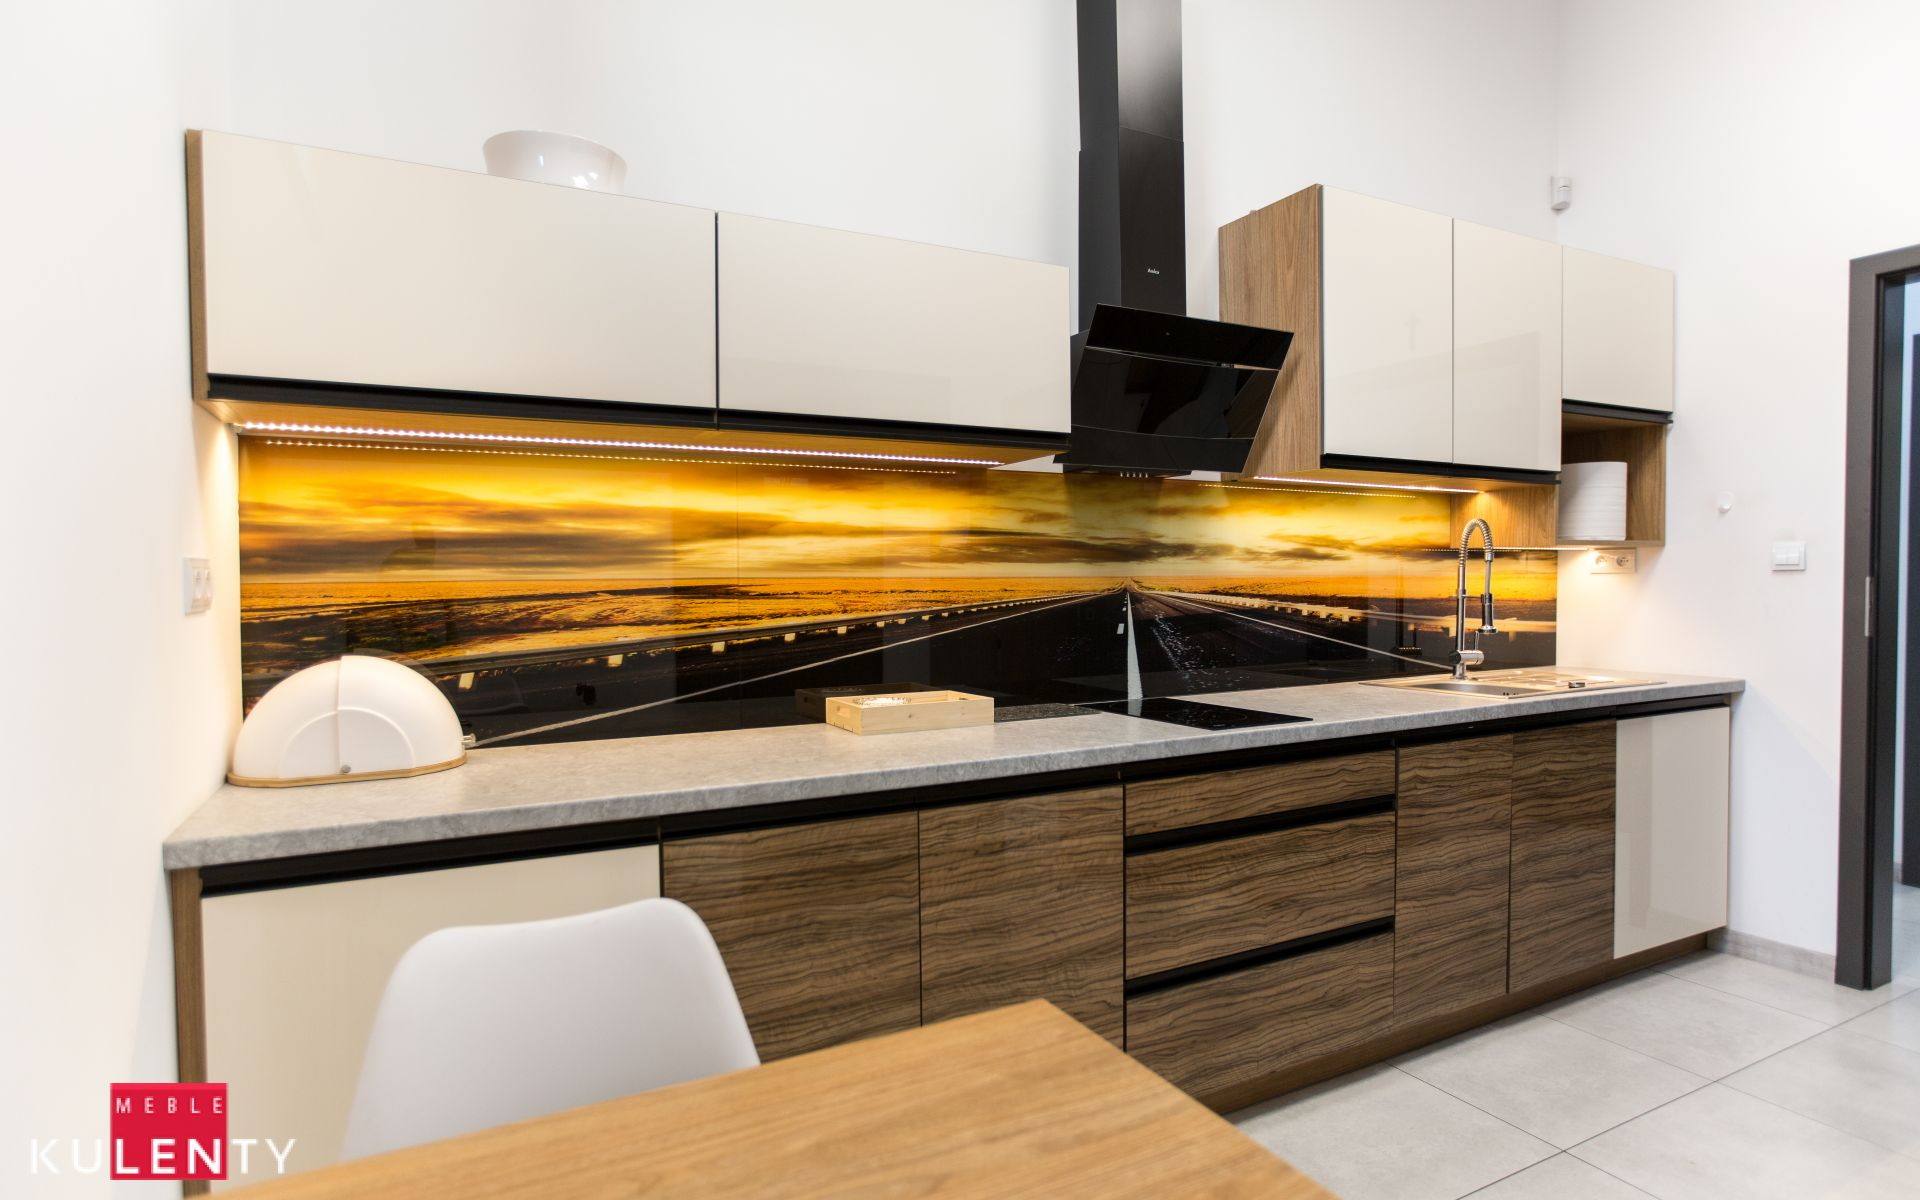 Fototapeta lacobel w kuchni